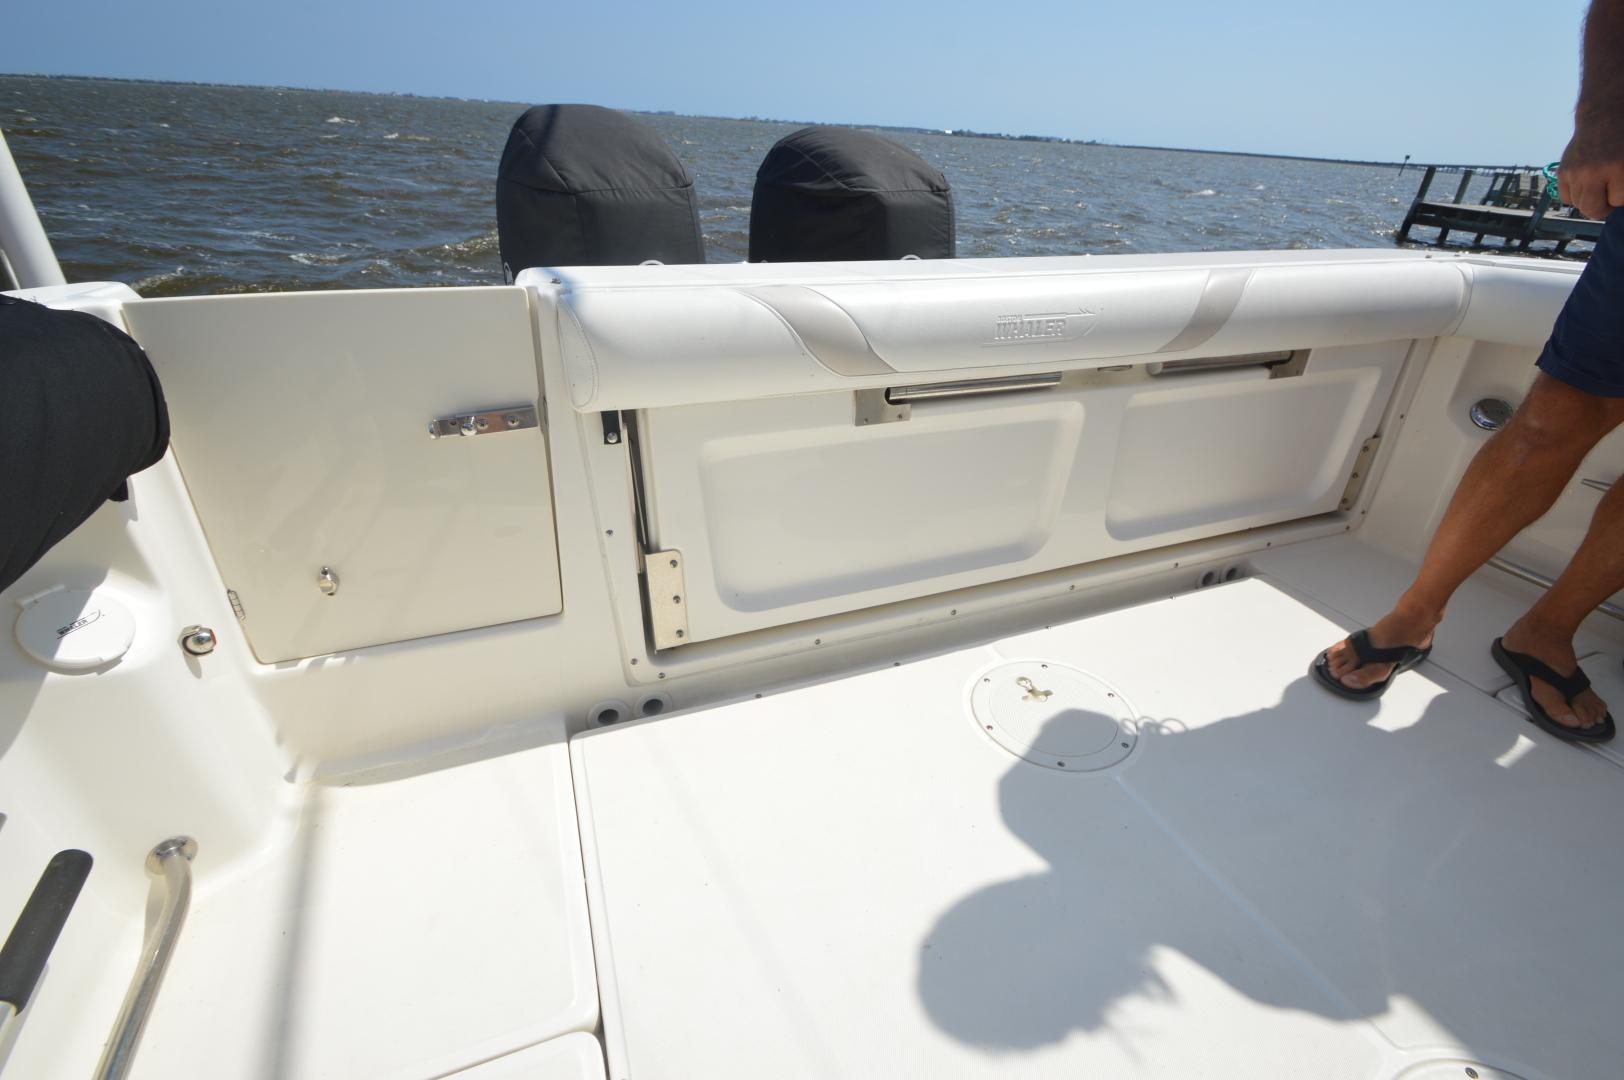 Boston Whaler-320 Outrage 2008 -Manteo-North Carolina-United States-1485483 | Thumbnail